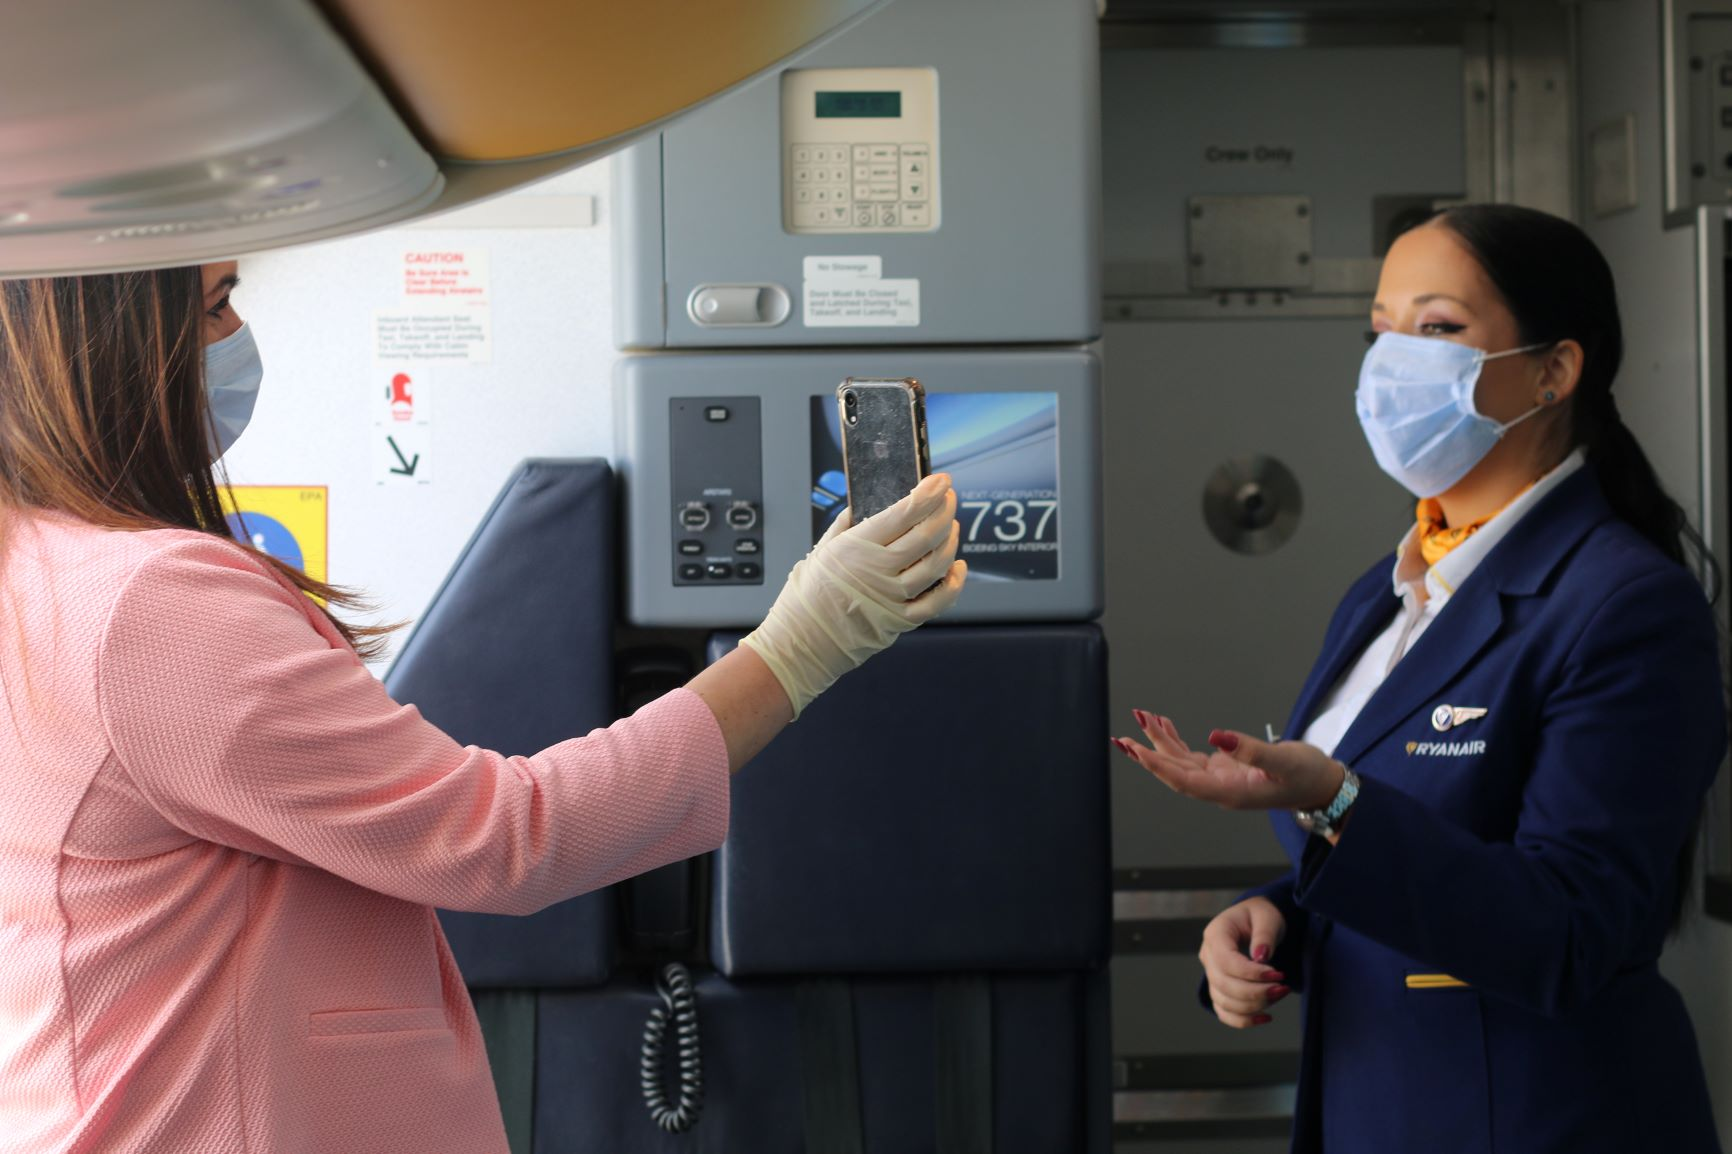 Boarding at Ryanair